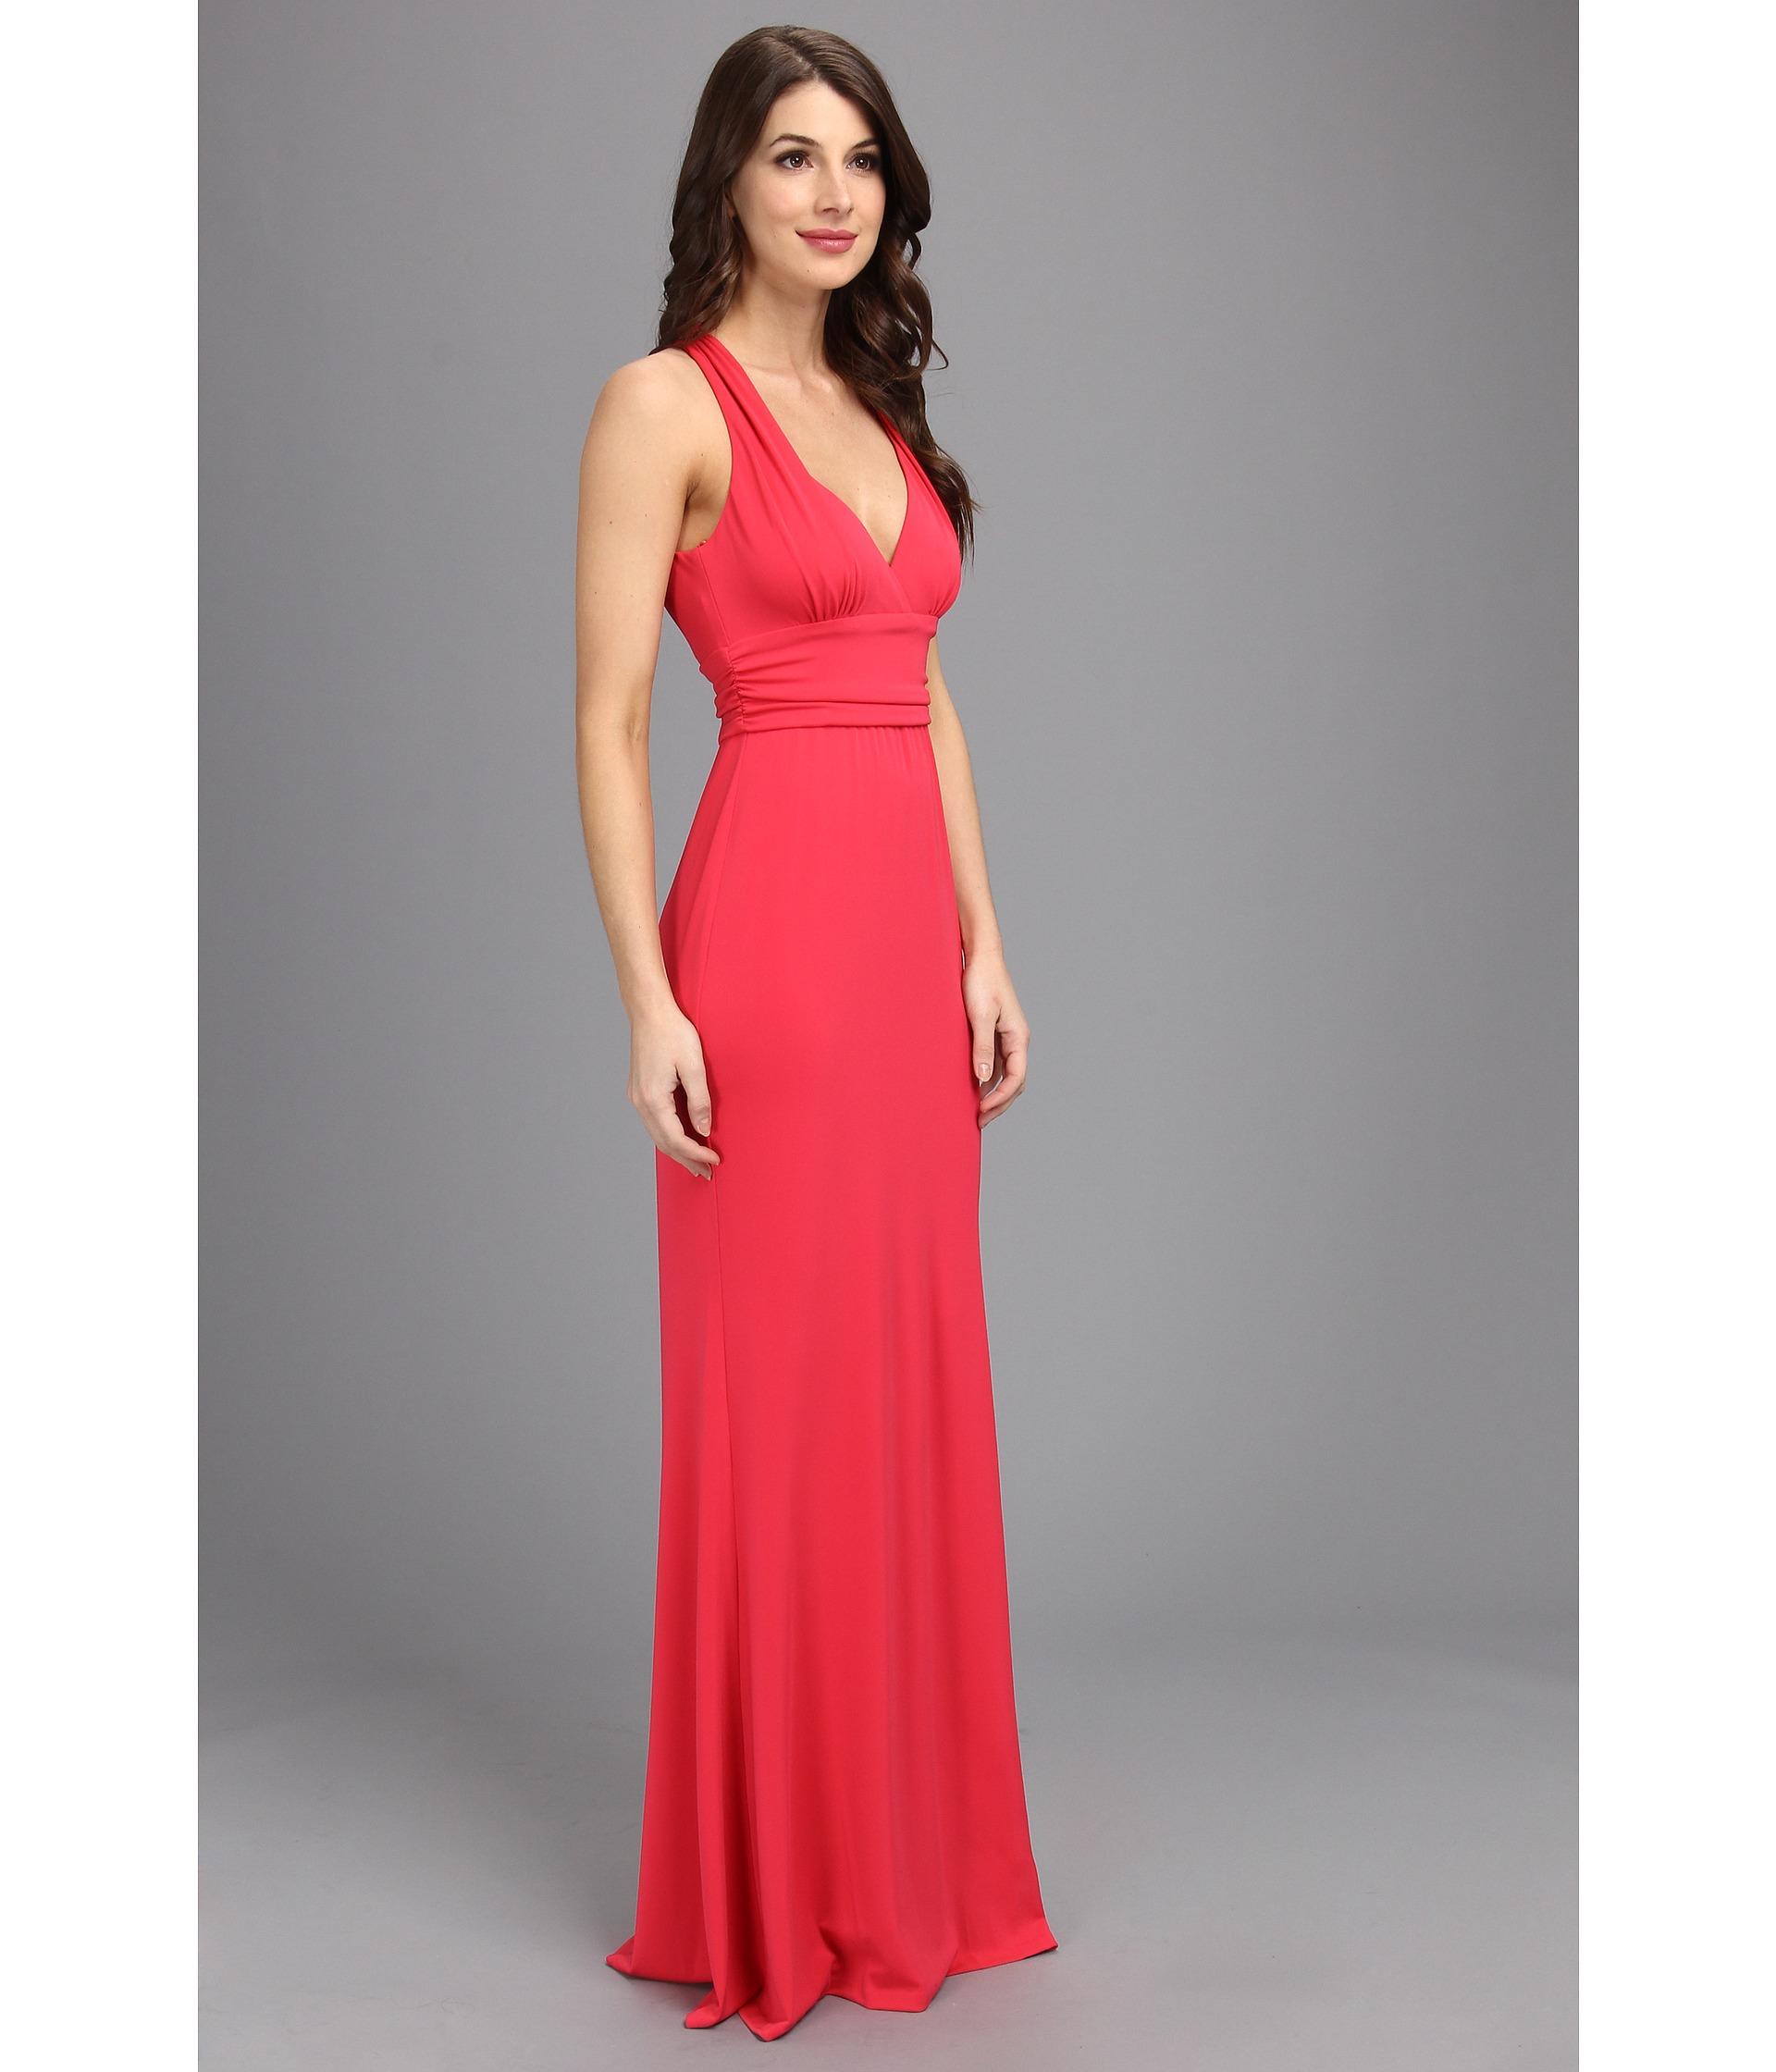 Nicole Miller Prom Dresses